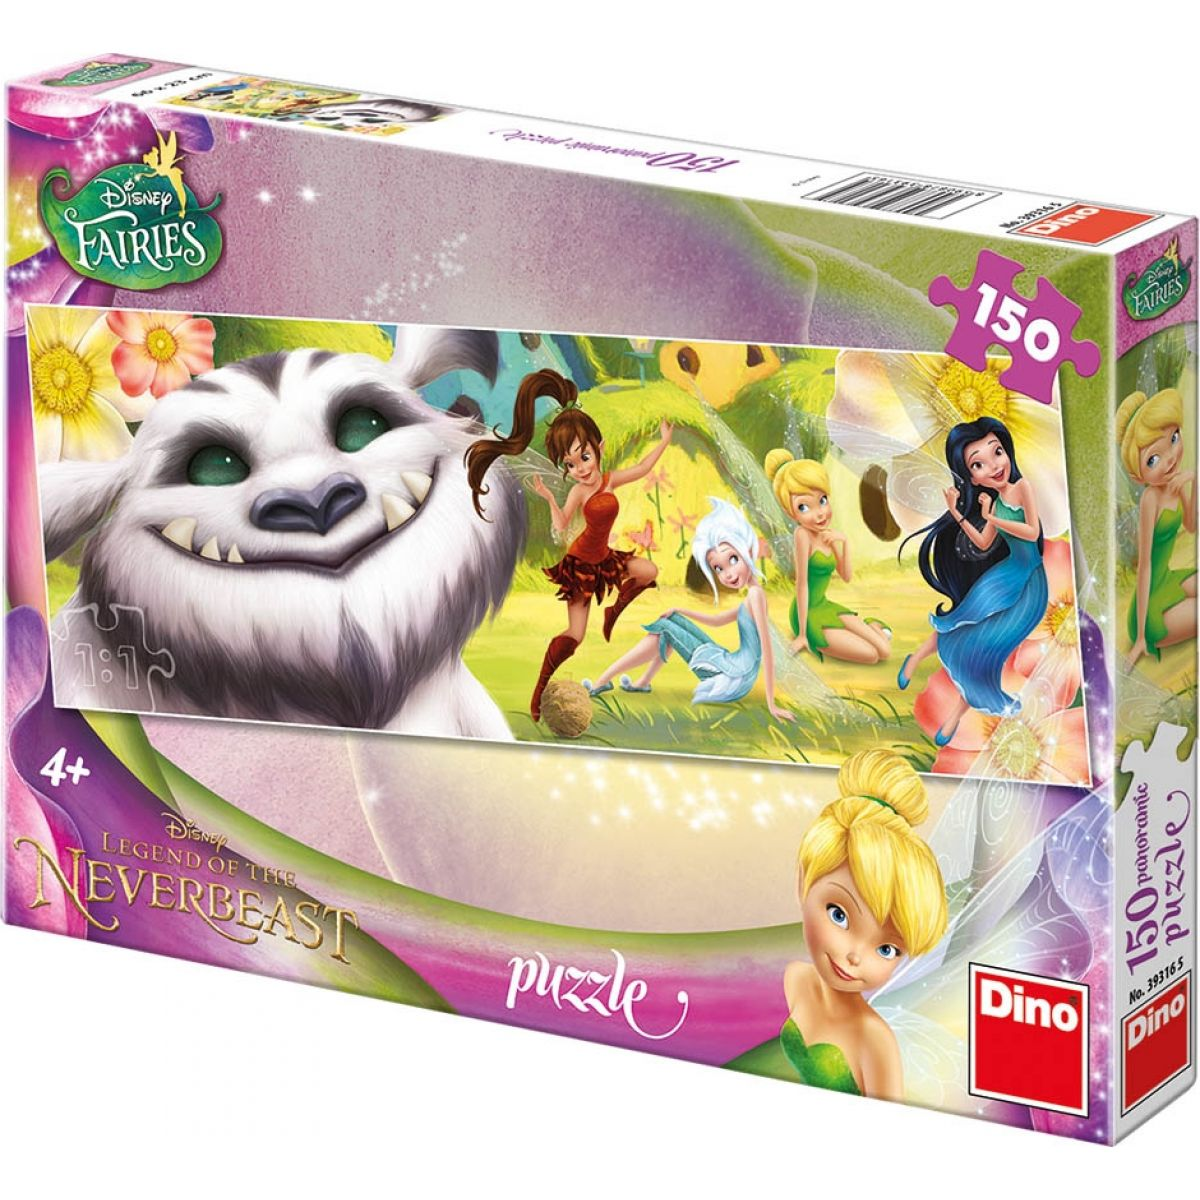 Dino Disney Fairies Puzzle Panoramic Víly a Raf 150dílků